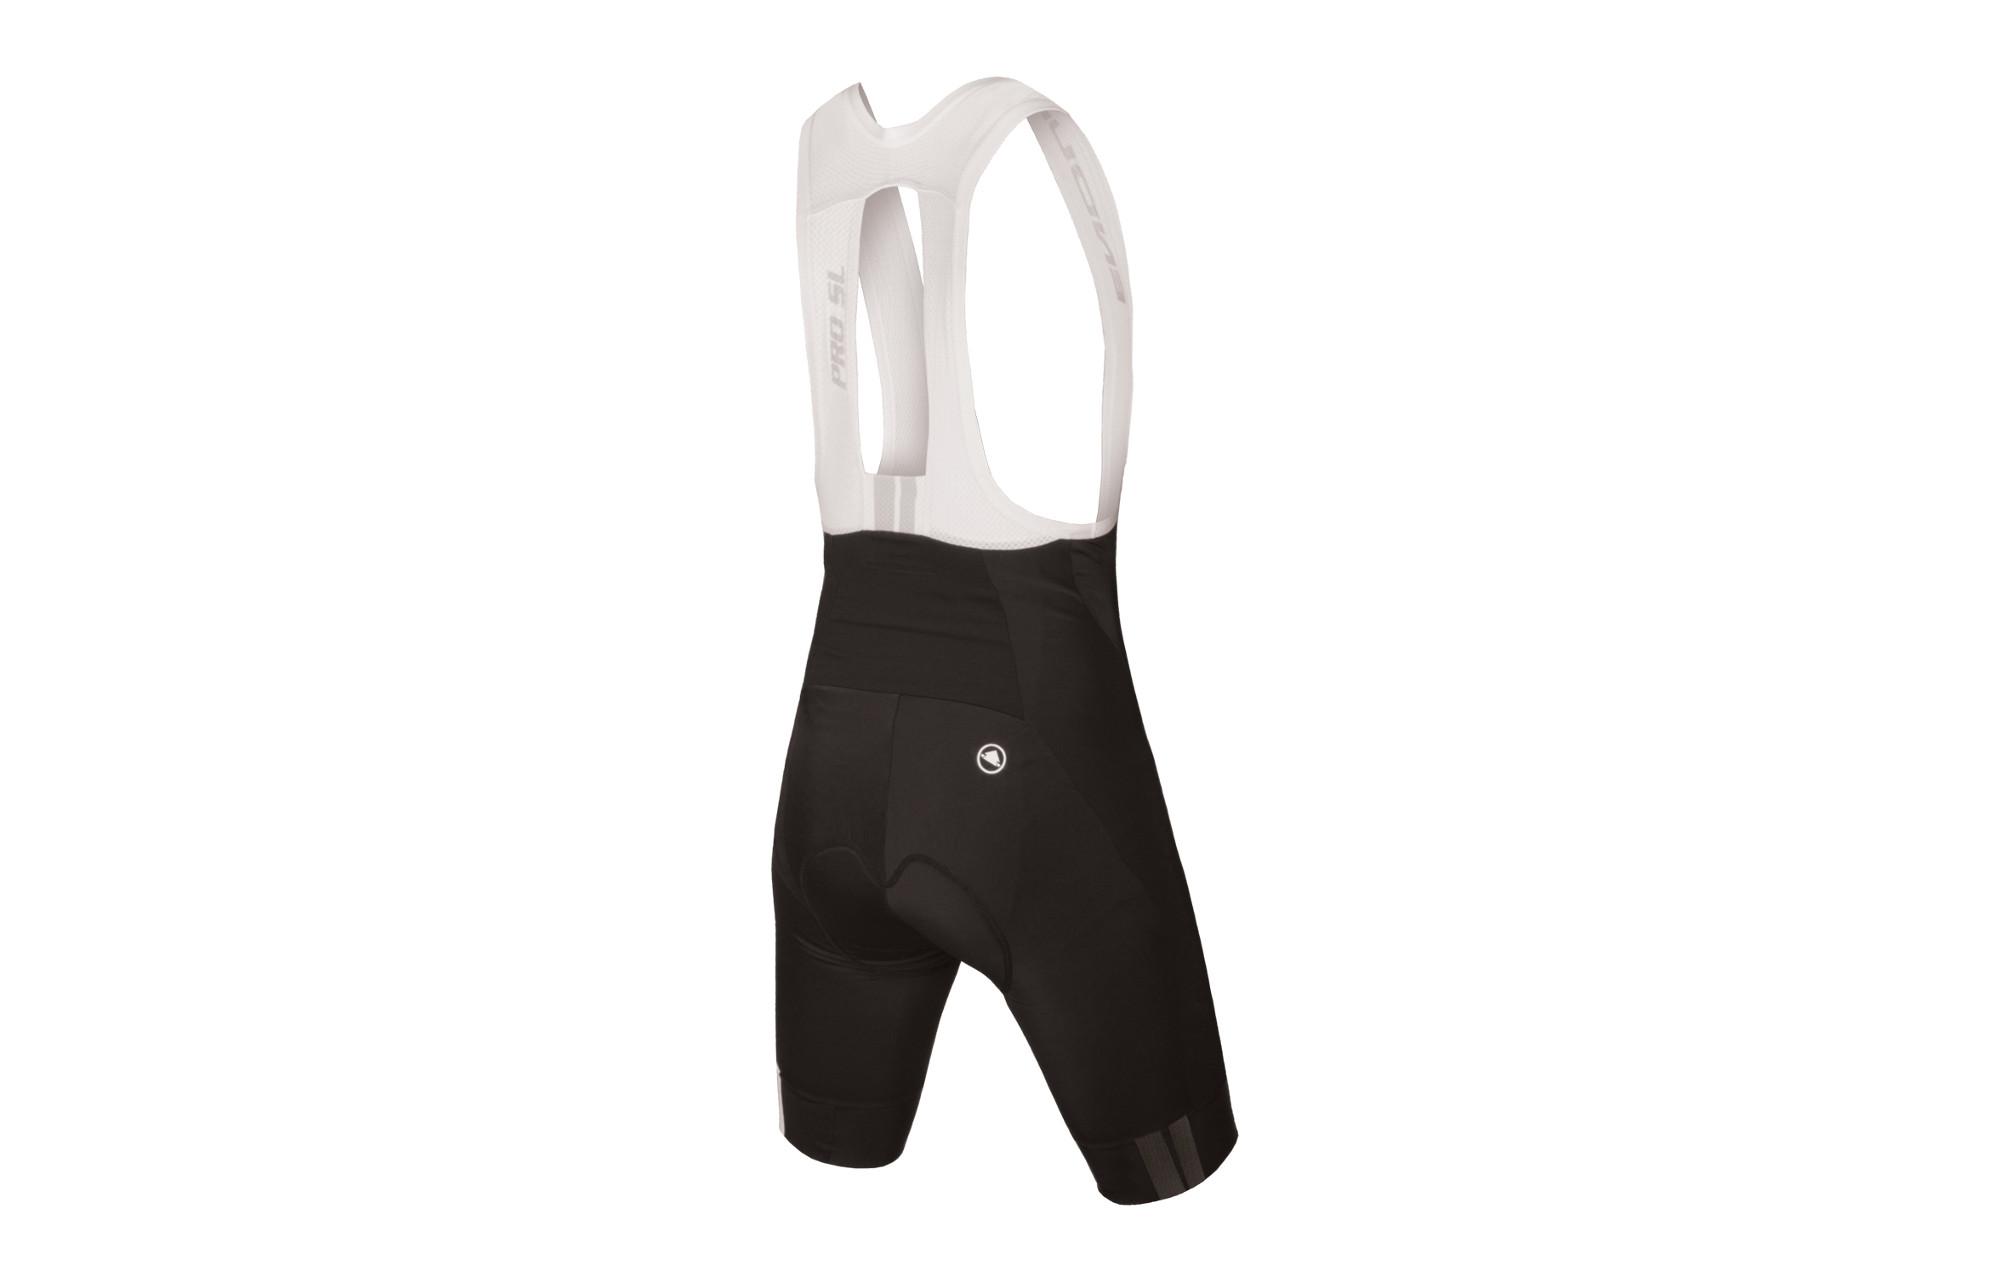 endura bib shorts size guide